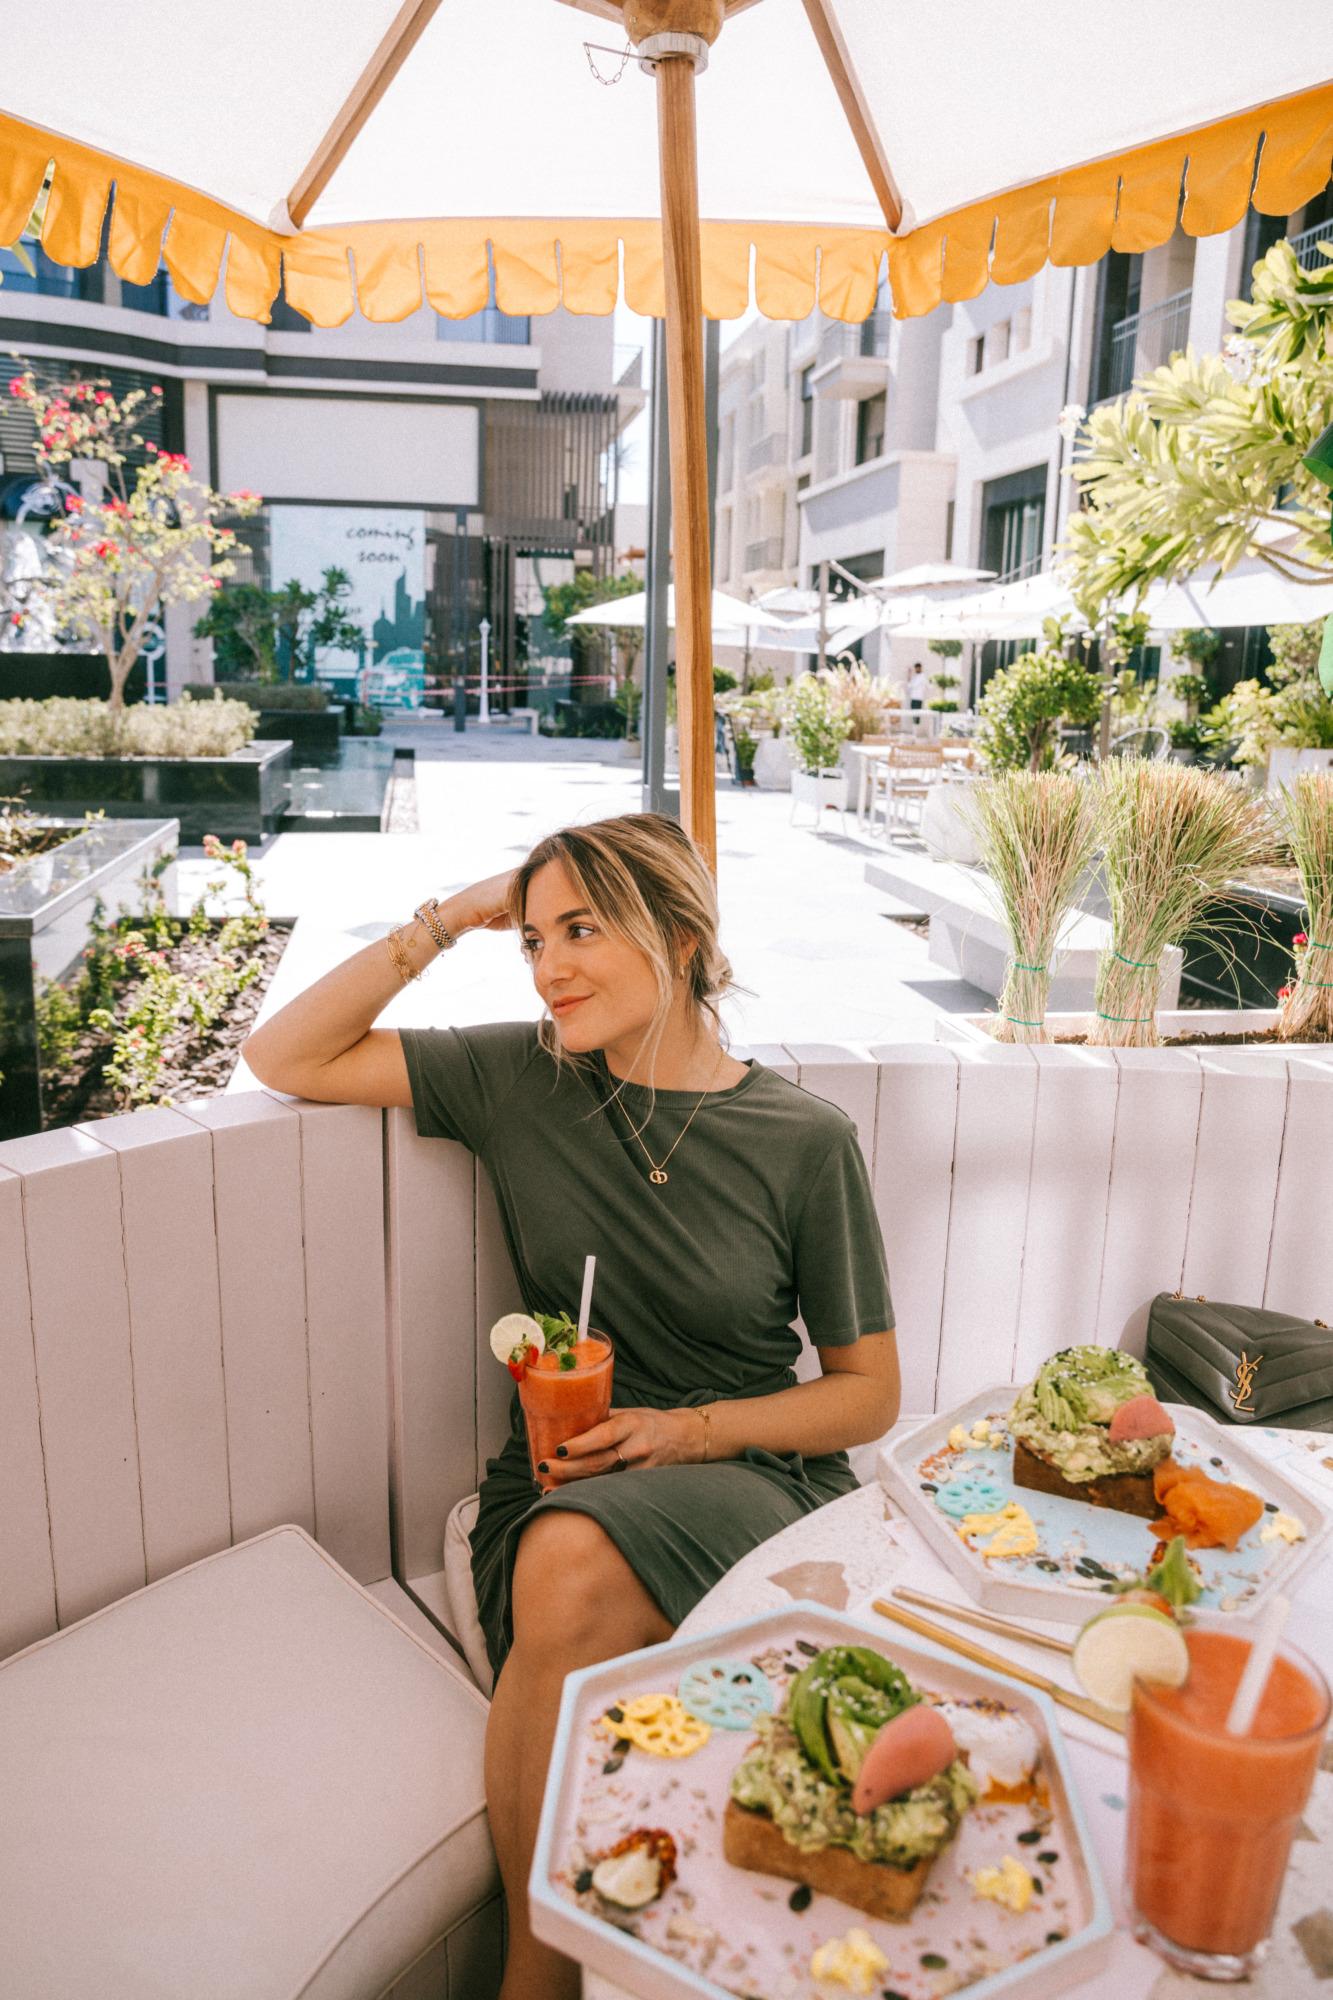 Brunch and Cake Dubaï - Blondie Baby blog voyages